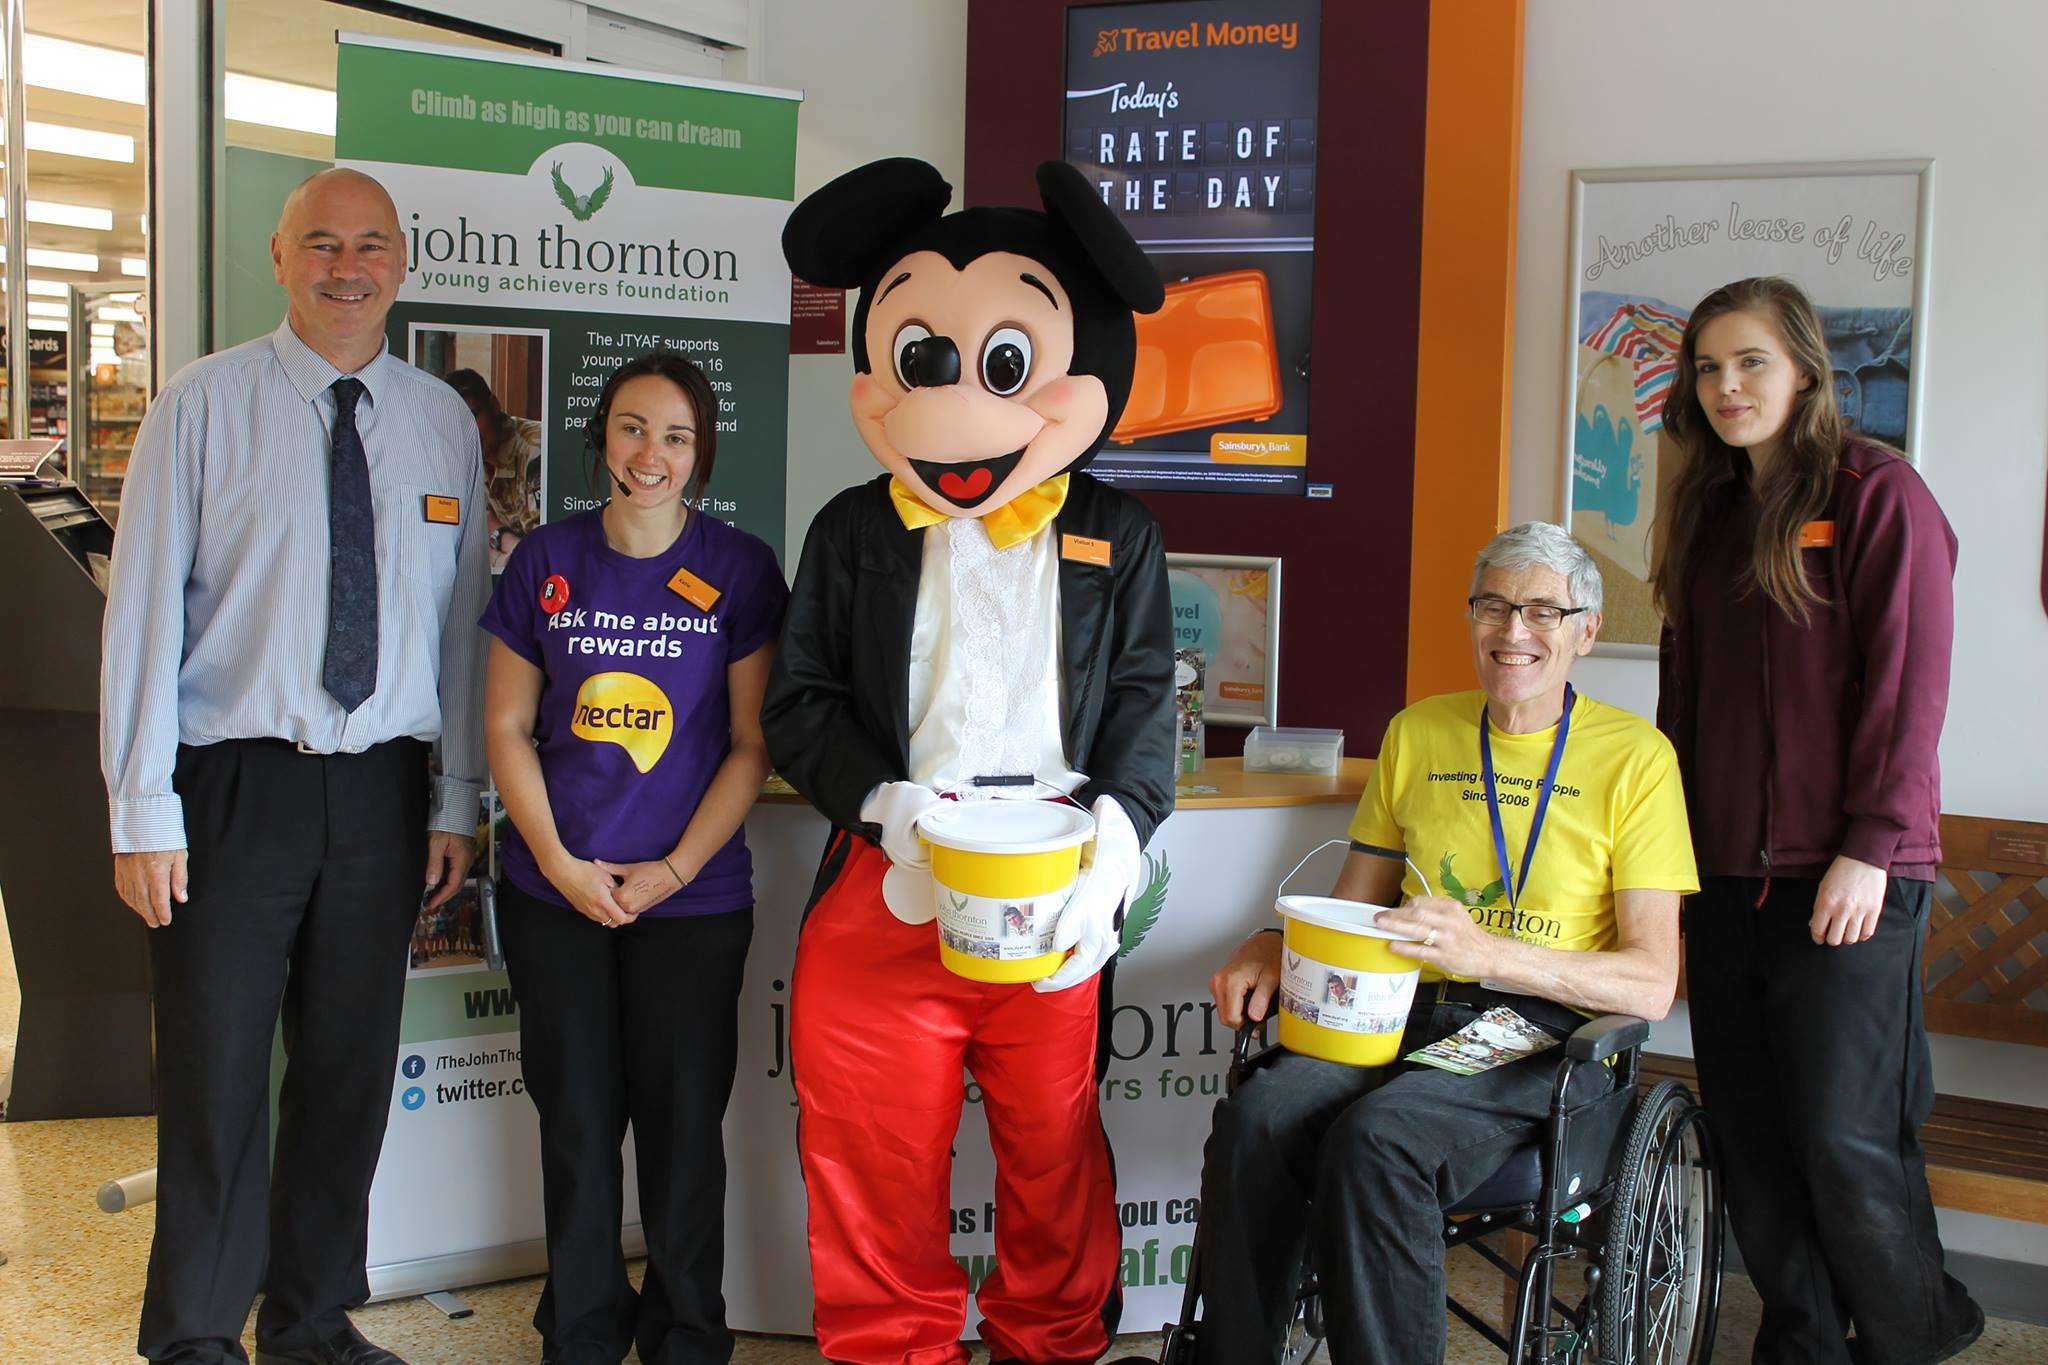 Sainsbury's manager Richard Lockett, a sainsbury's volunteer, mickey mouse, volunteer David Howelett and another sainsbury's volunteer